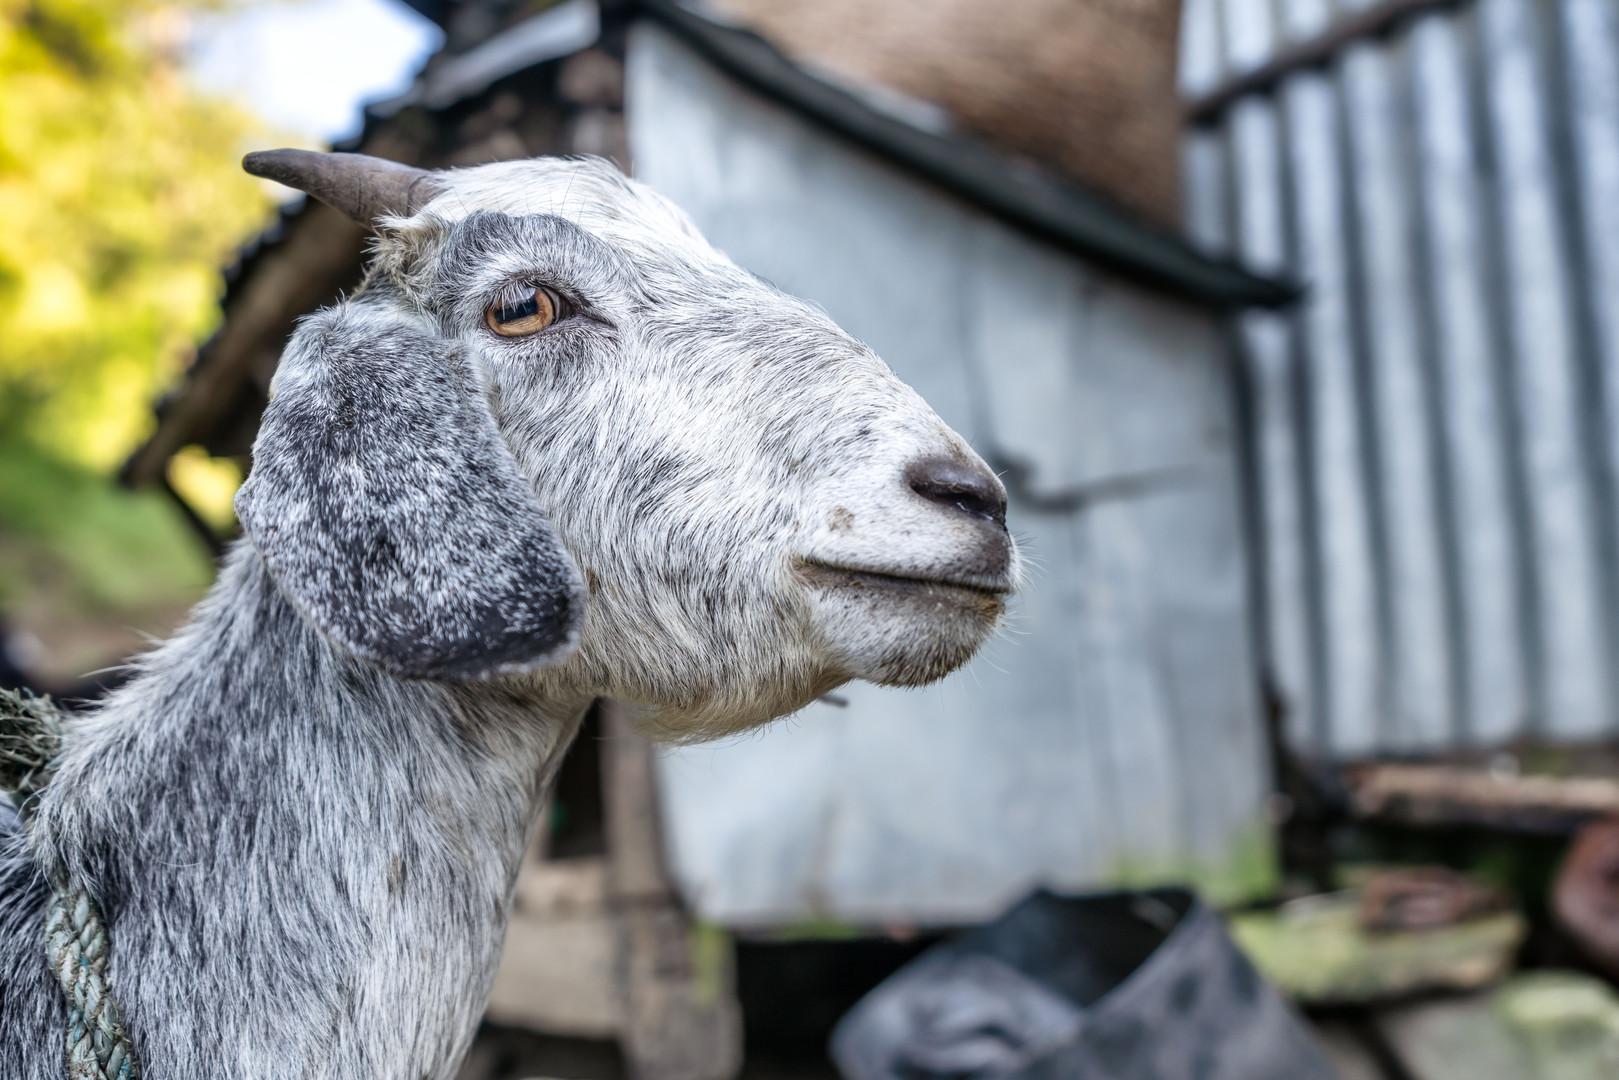 Goat in rural Nepal